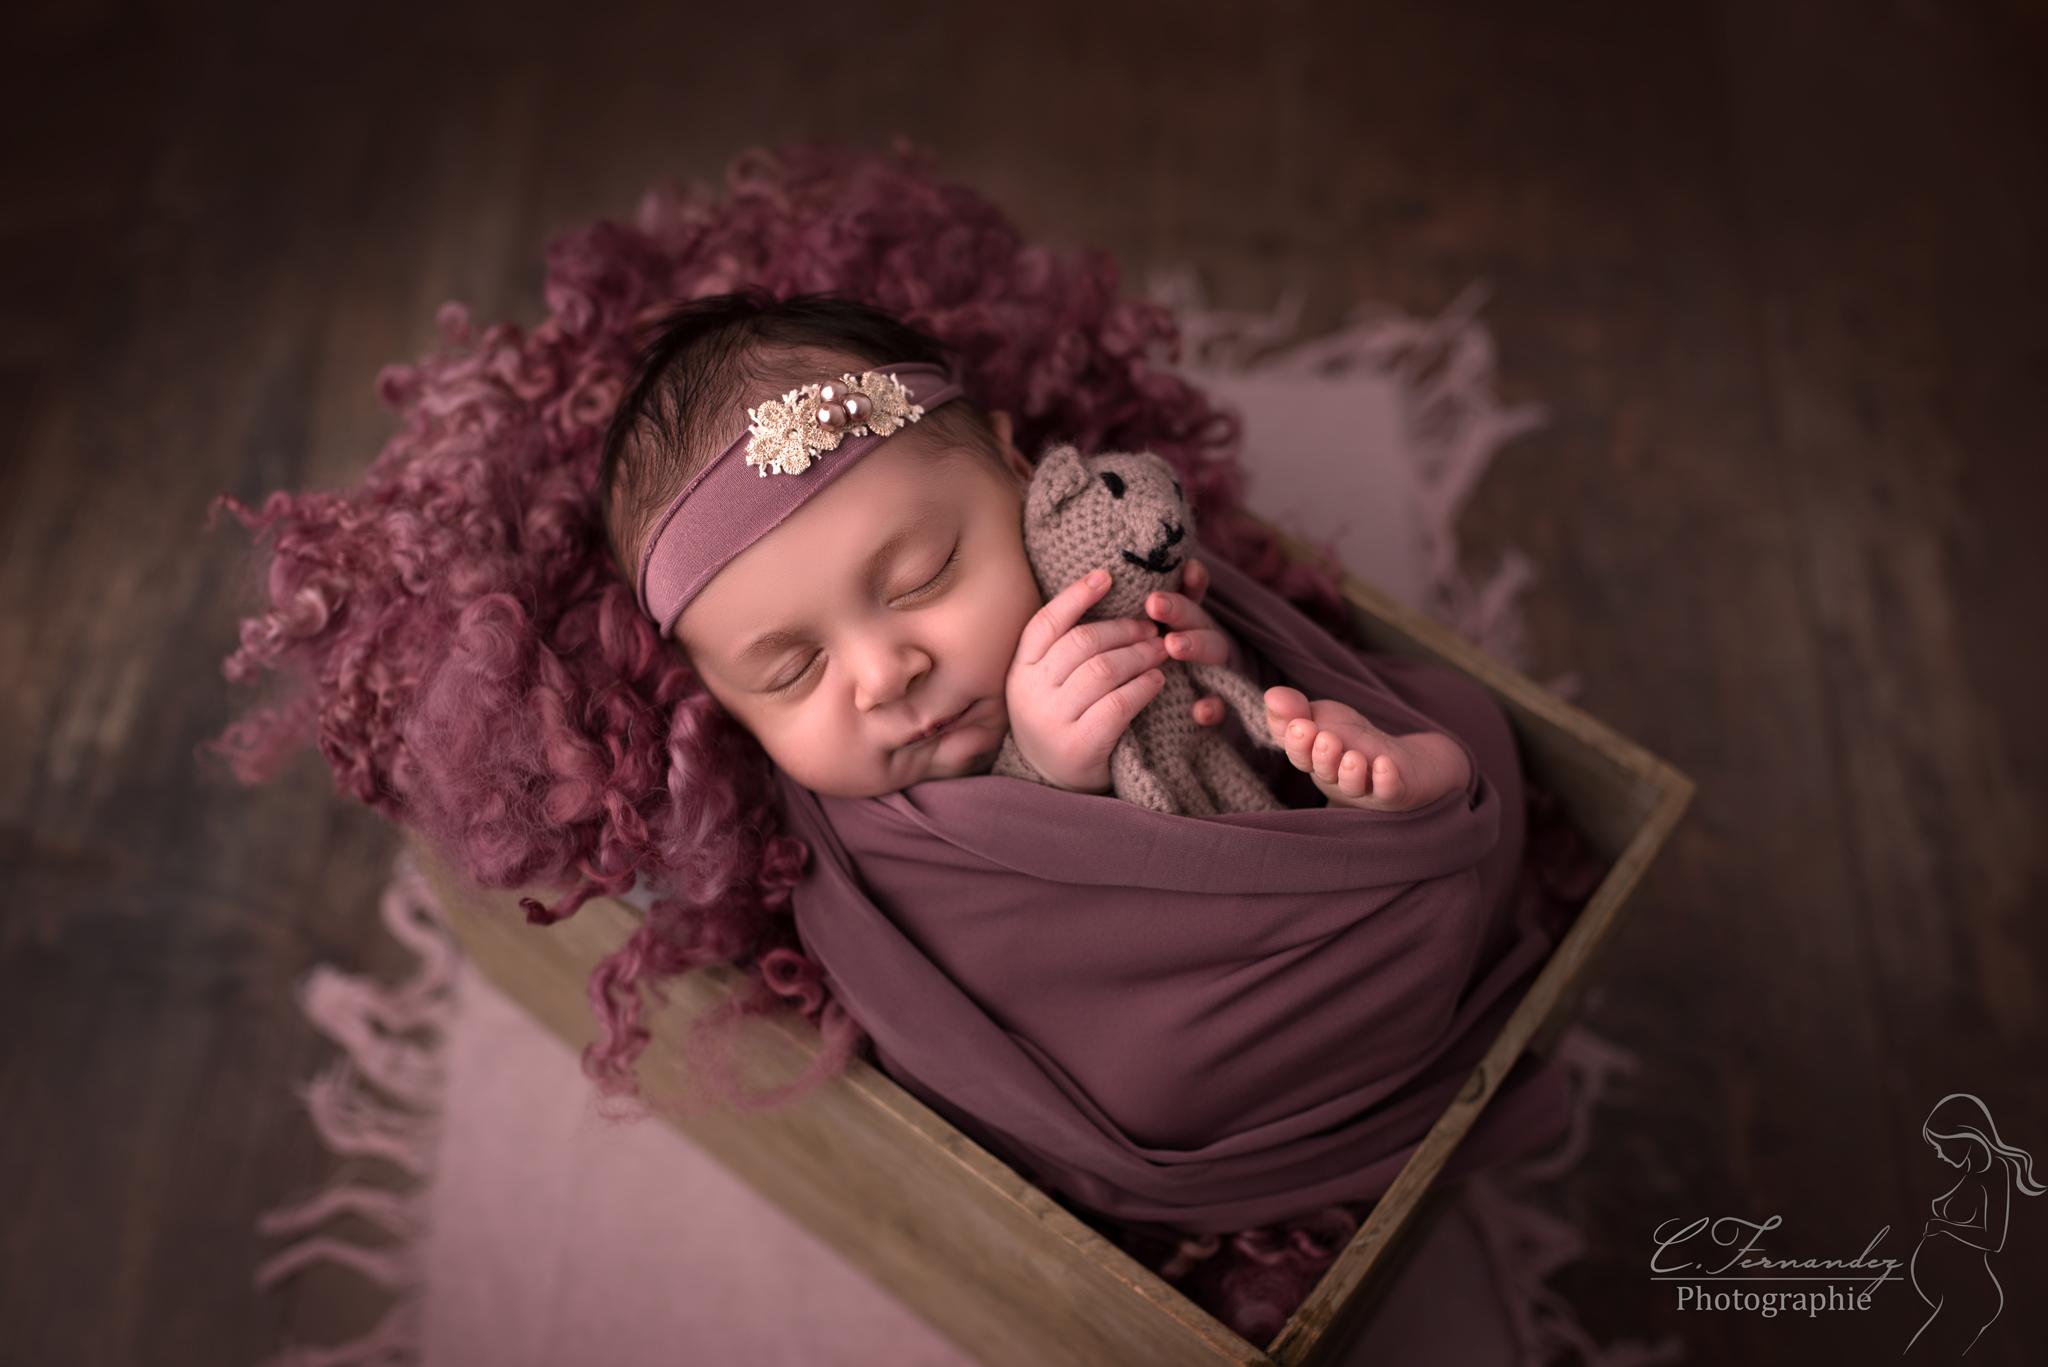 Photographe nouveau né Gemenos, phtotgraphe bébé Gémenos. Photographe spécialisée nouveau-né à Gémenos. Cindy Fernandez Photographe.